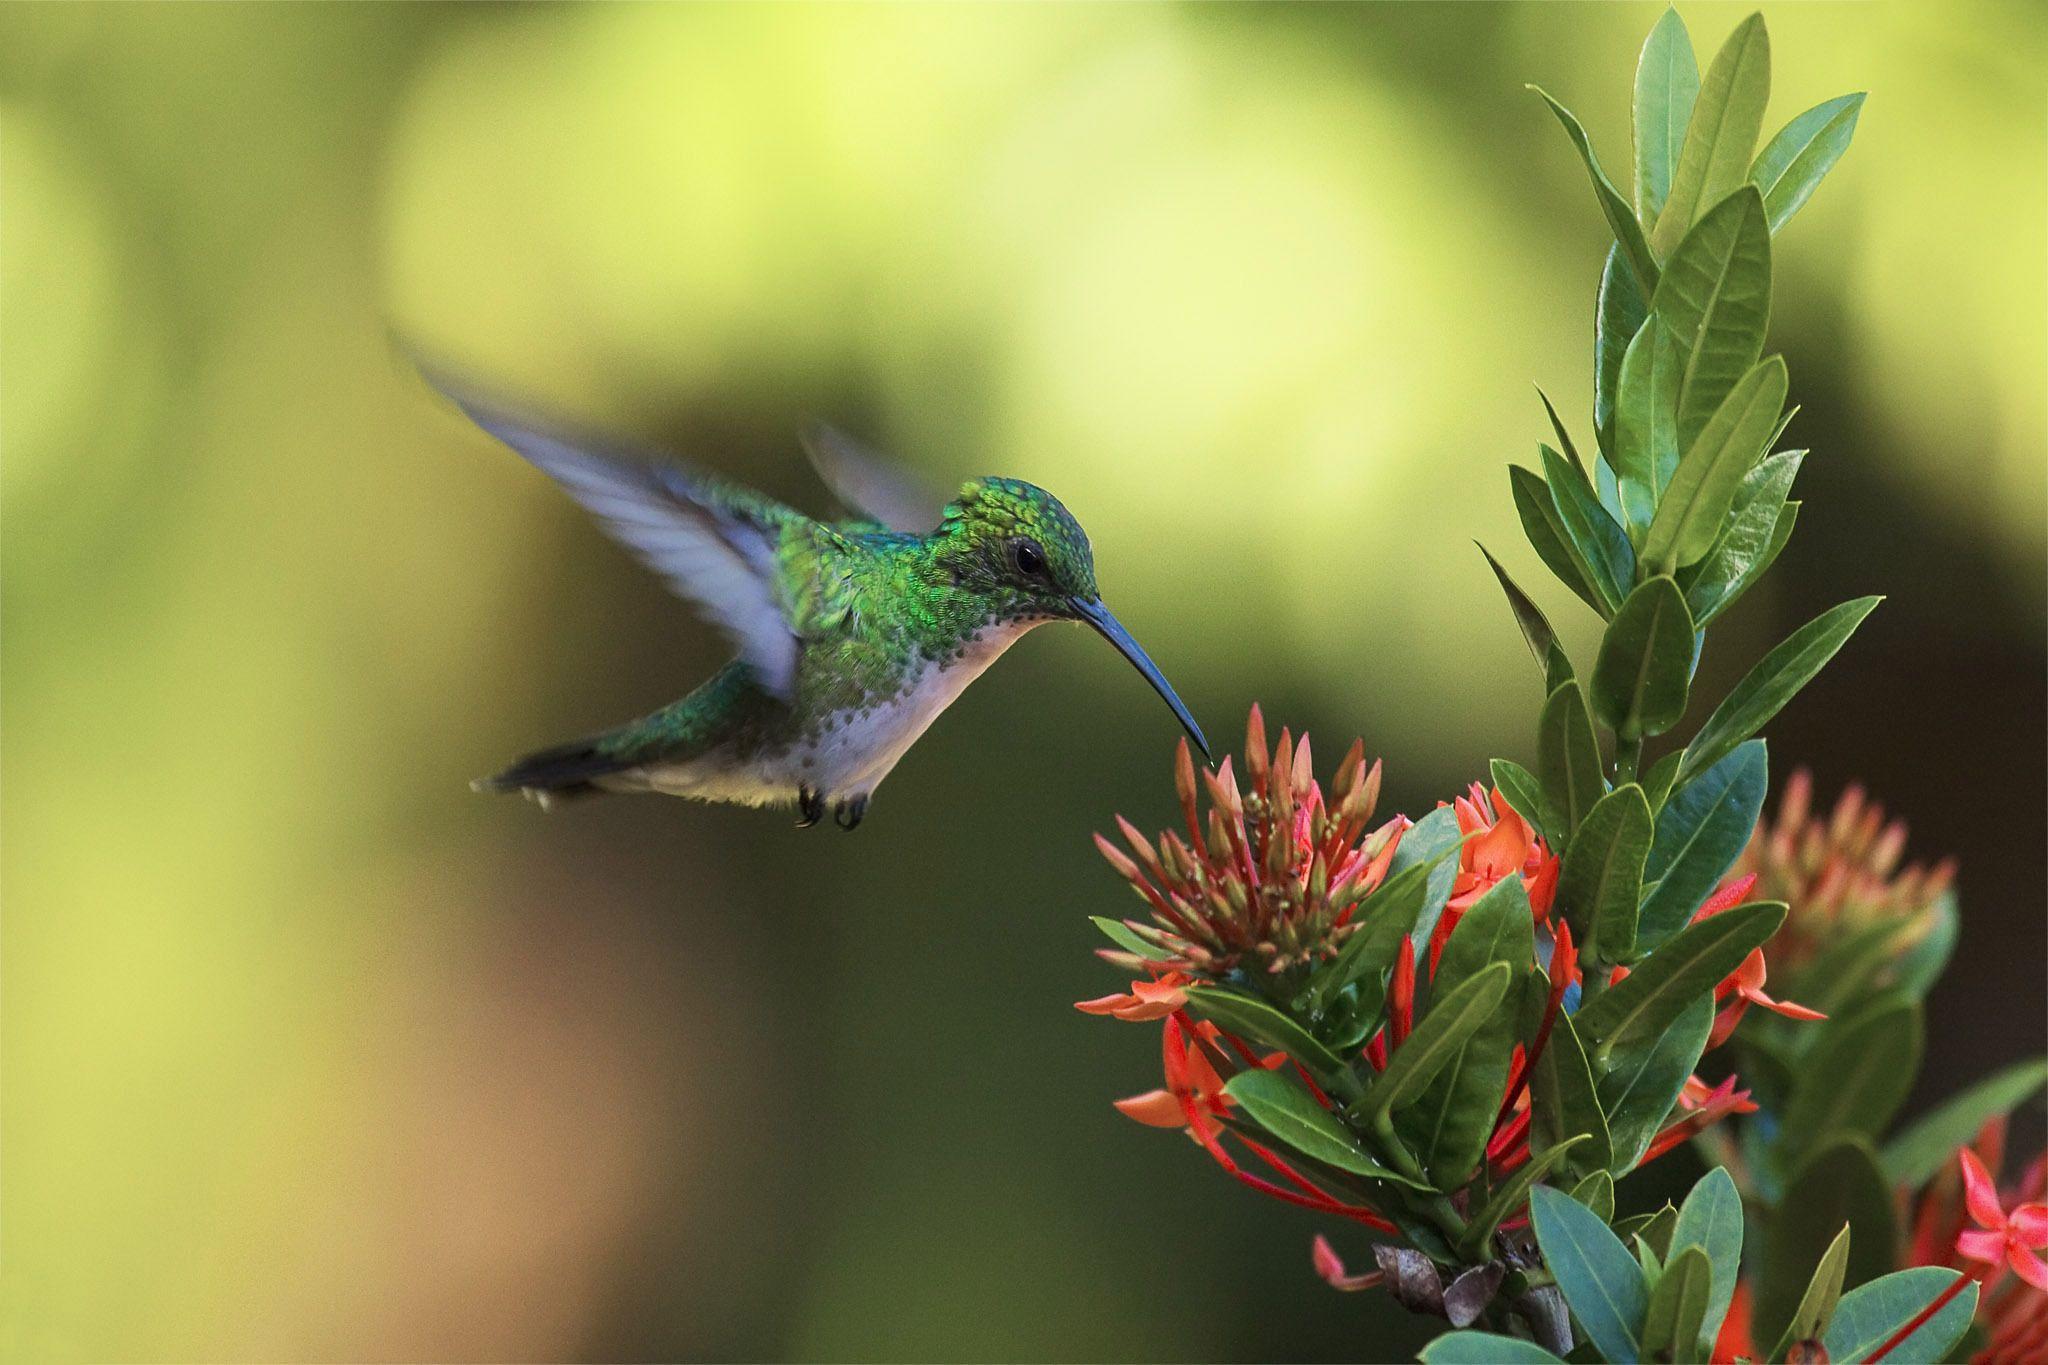 Animaux Colibri Humming Bird Floraison Fleur